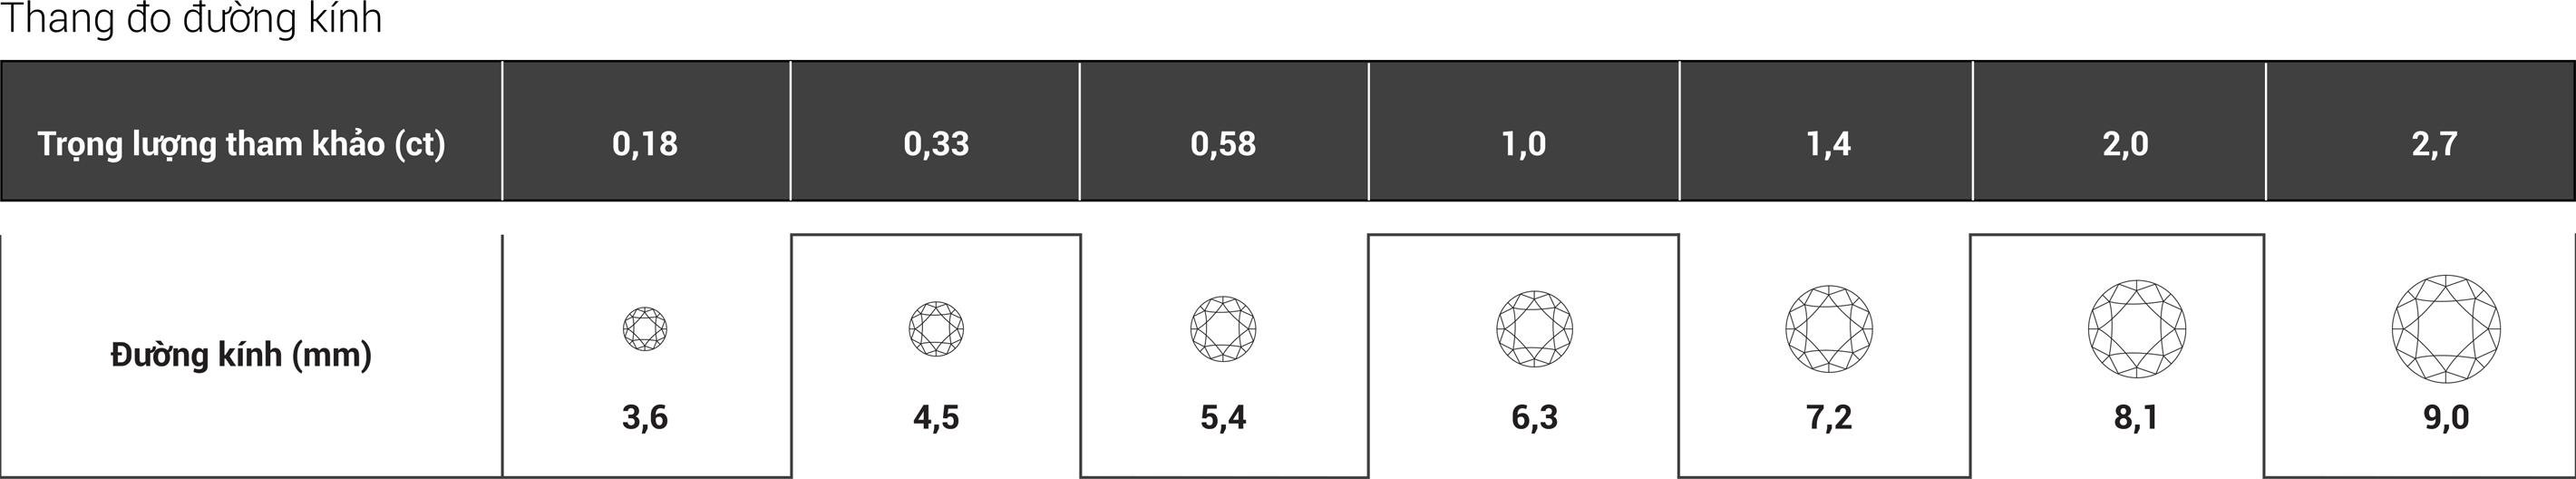 Tiêu chí 5: Kích cỡ kim cương (Carat Weight/Measurements)